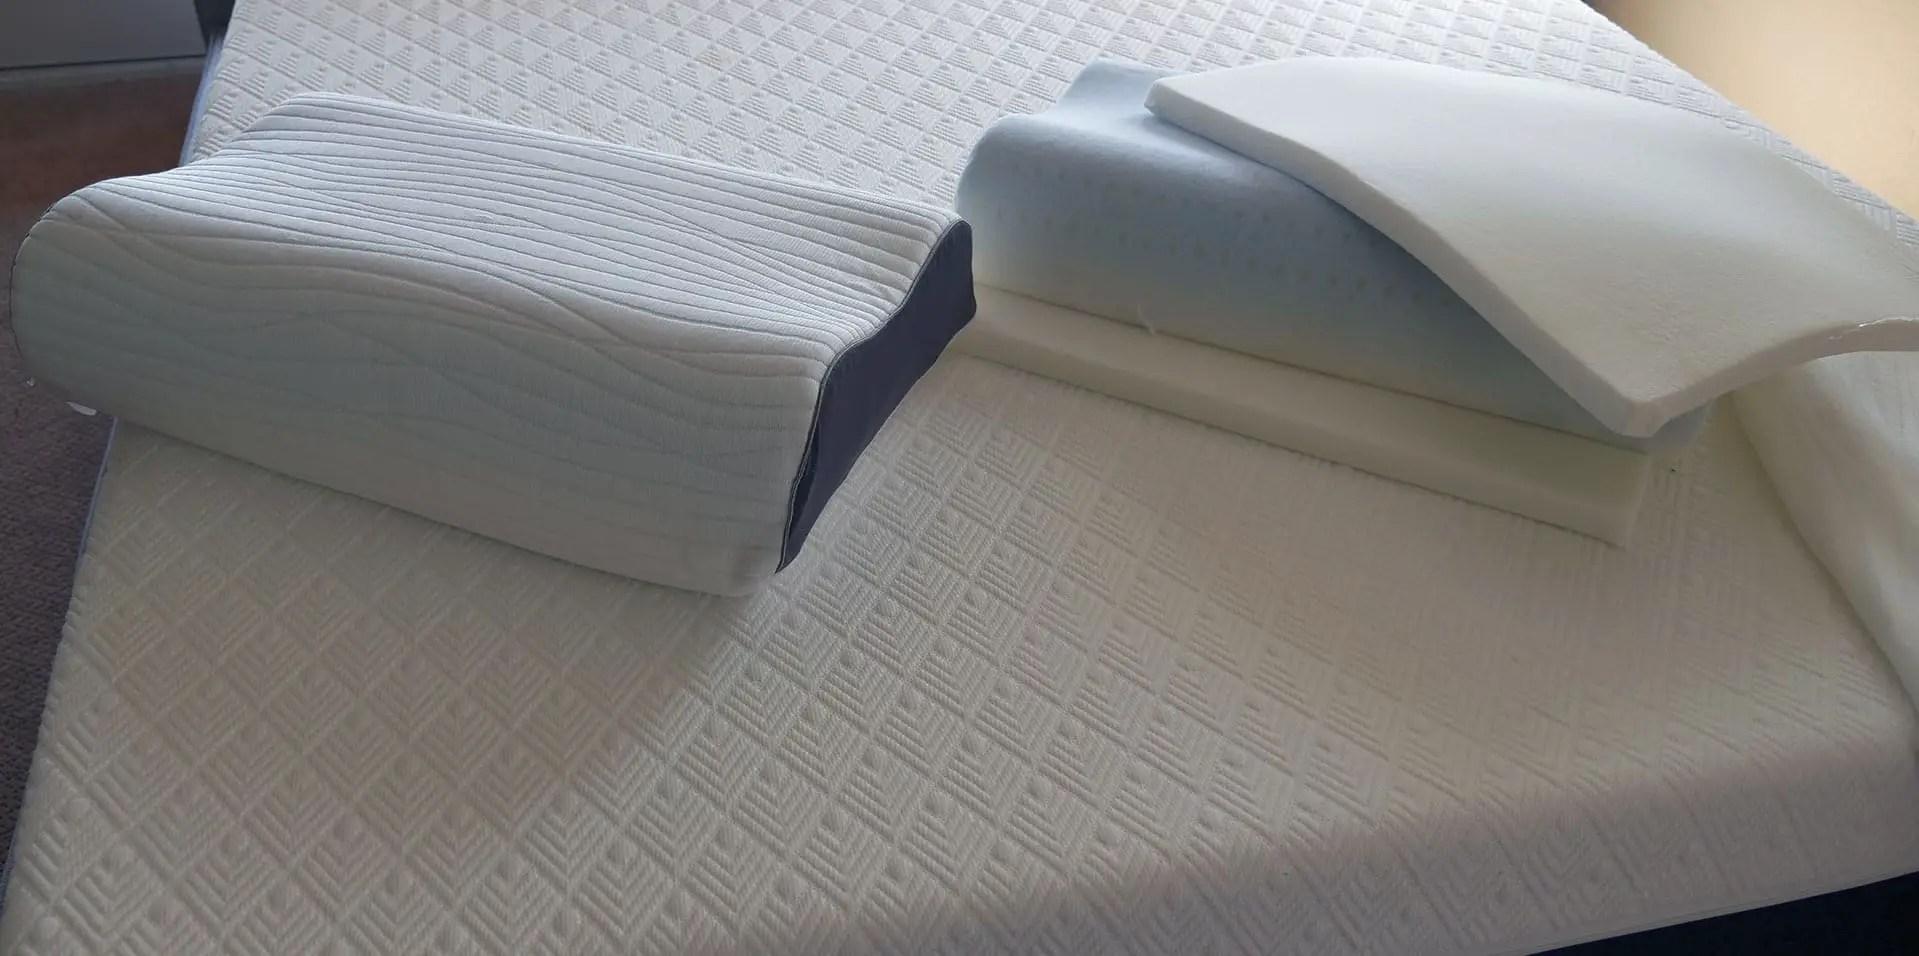 dreamcloud pillows 2021 non biased reviews